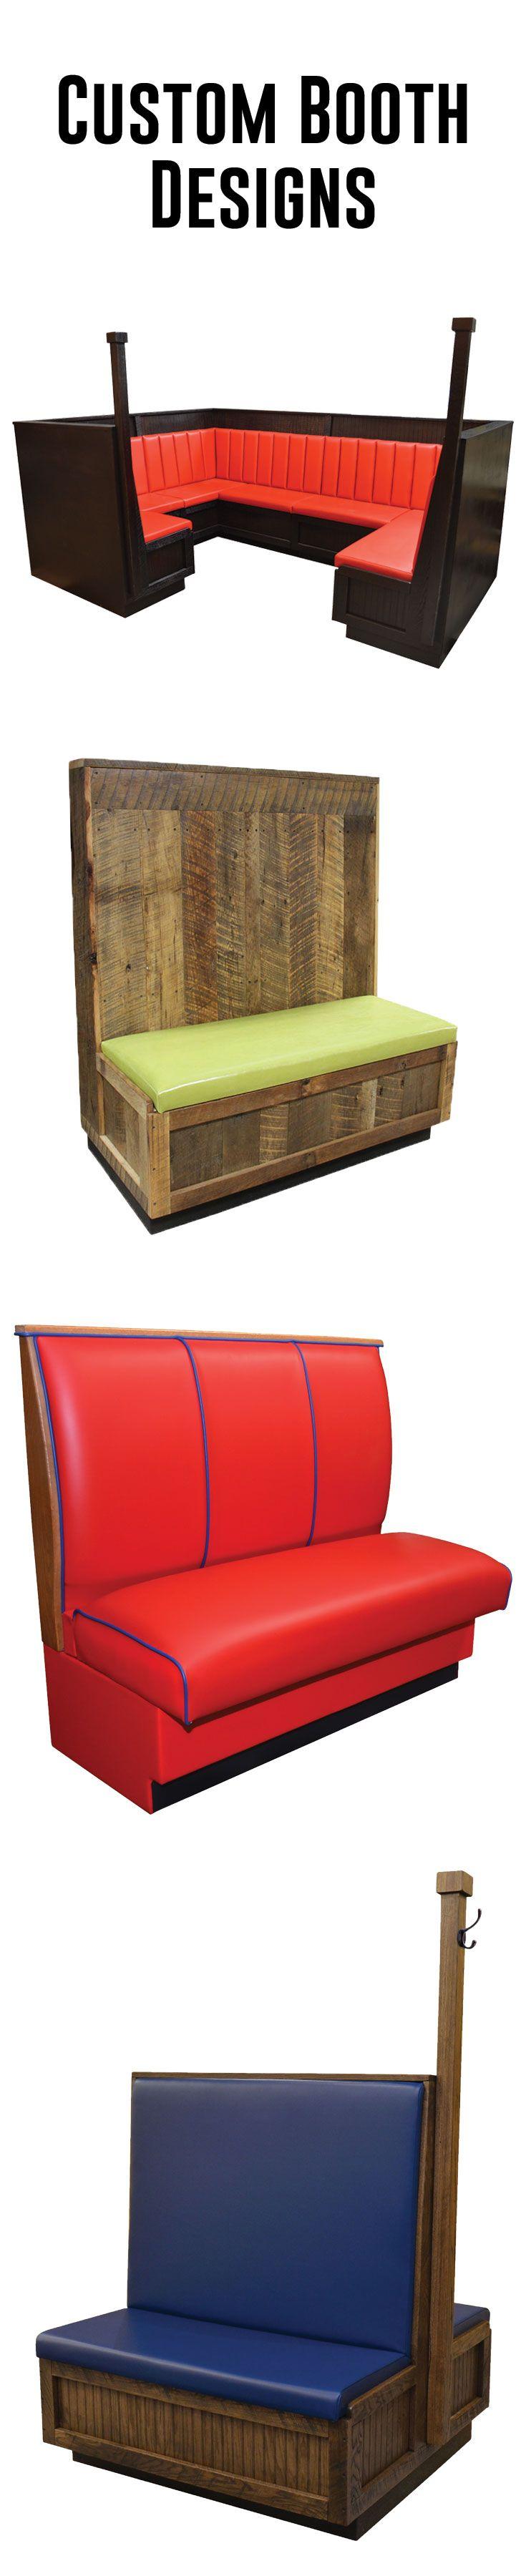 Restaurant furniture booths - Custom Restaurant Booth Designs Restaurant Furniture Commercial Furniture